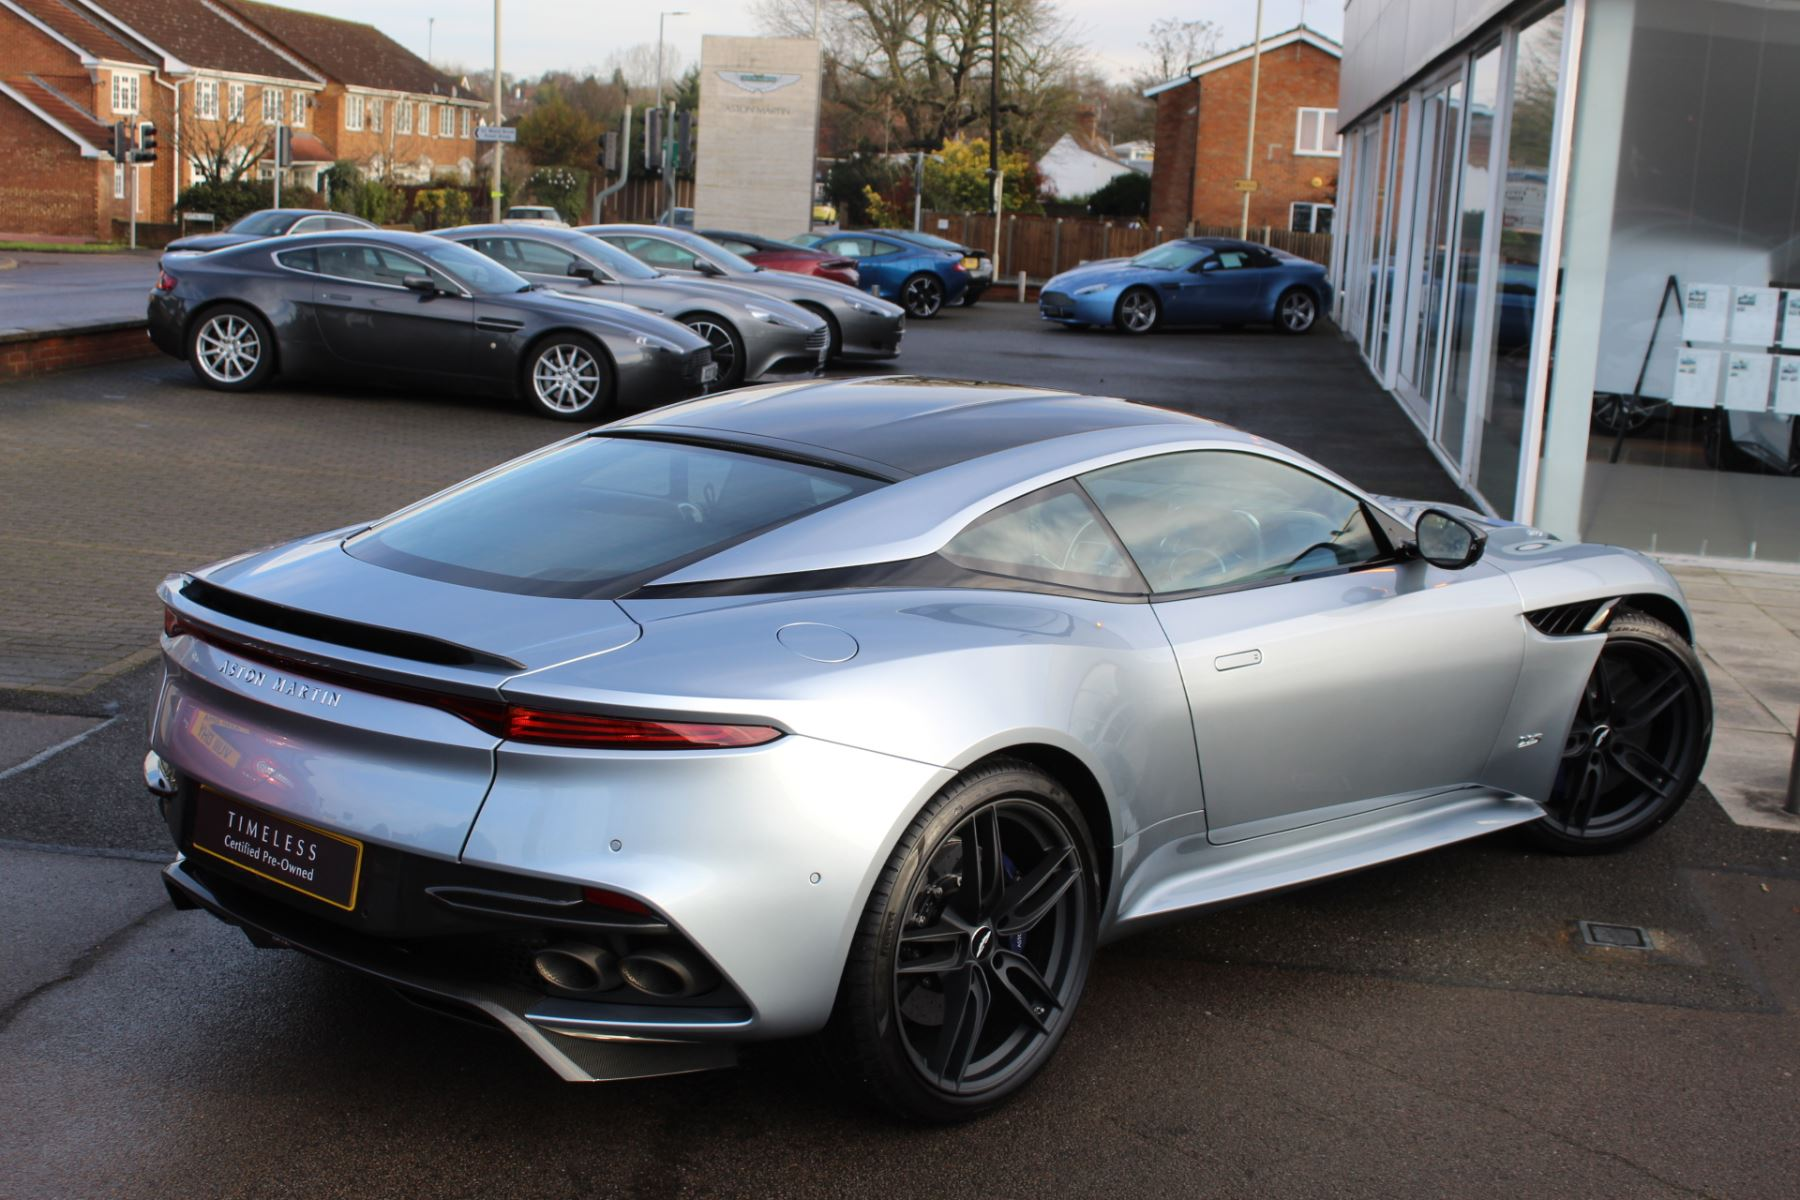 Aston Martin DBS Superleggera V12 2dr Touchtronic image 17